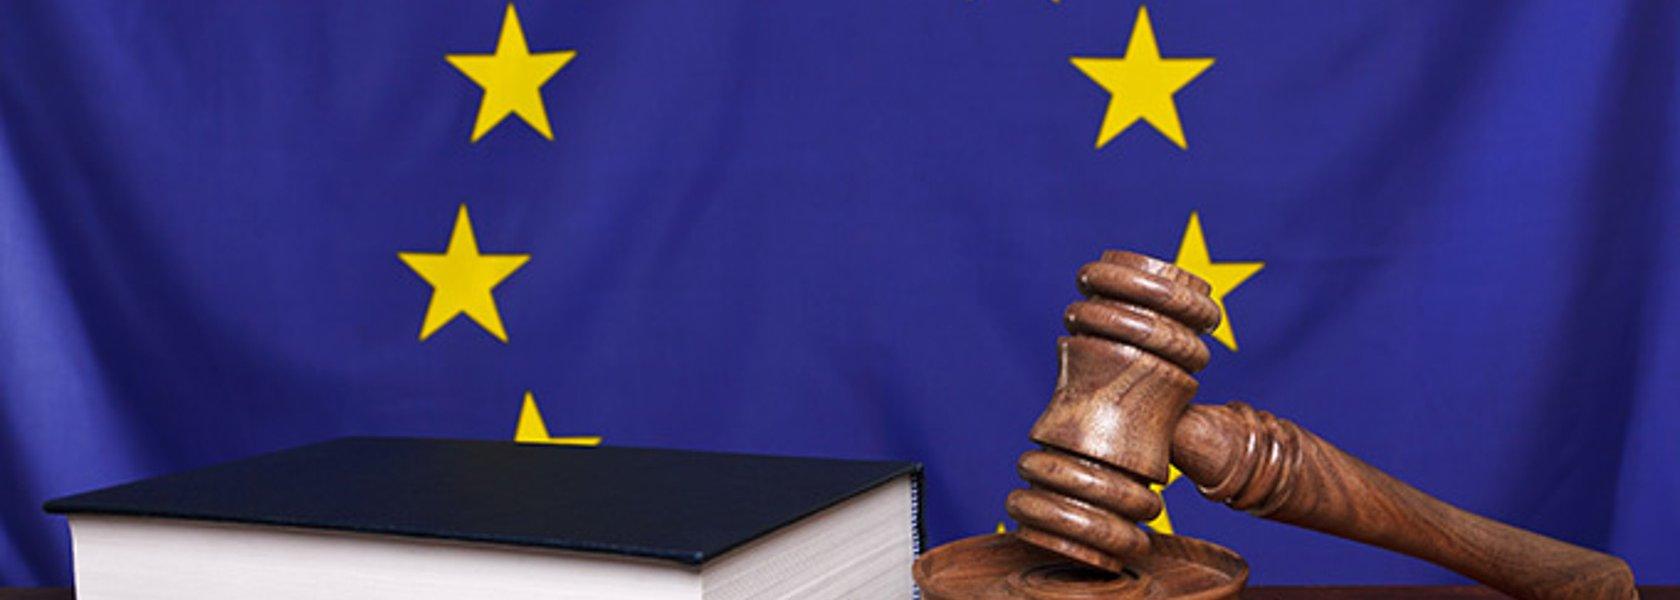 eu countrys national law - 1280×587